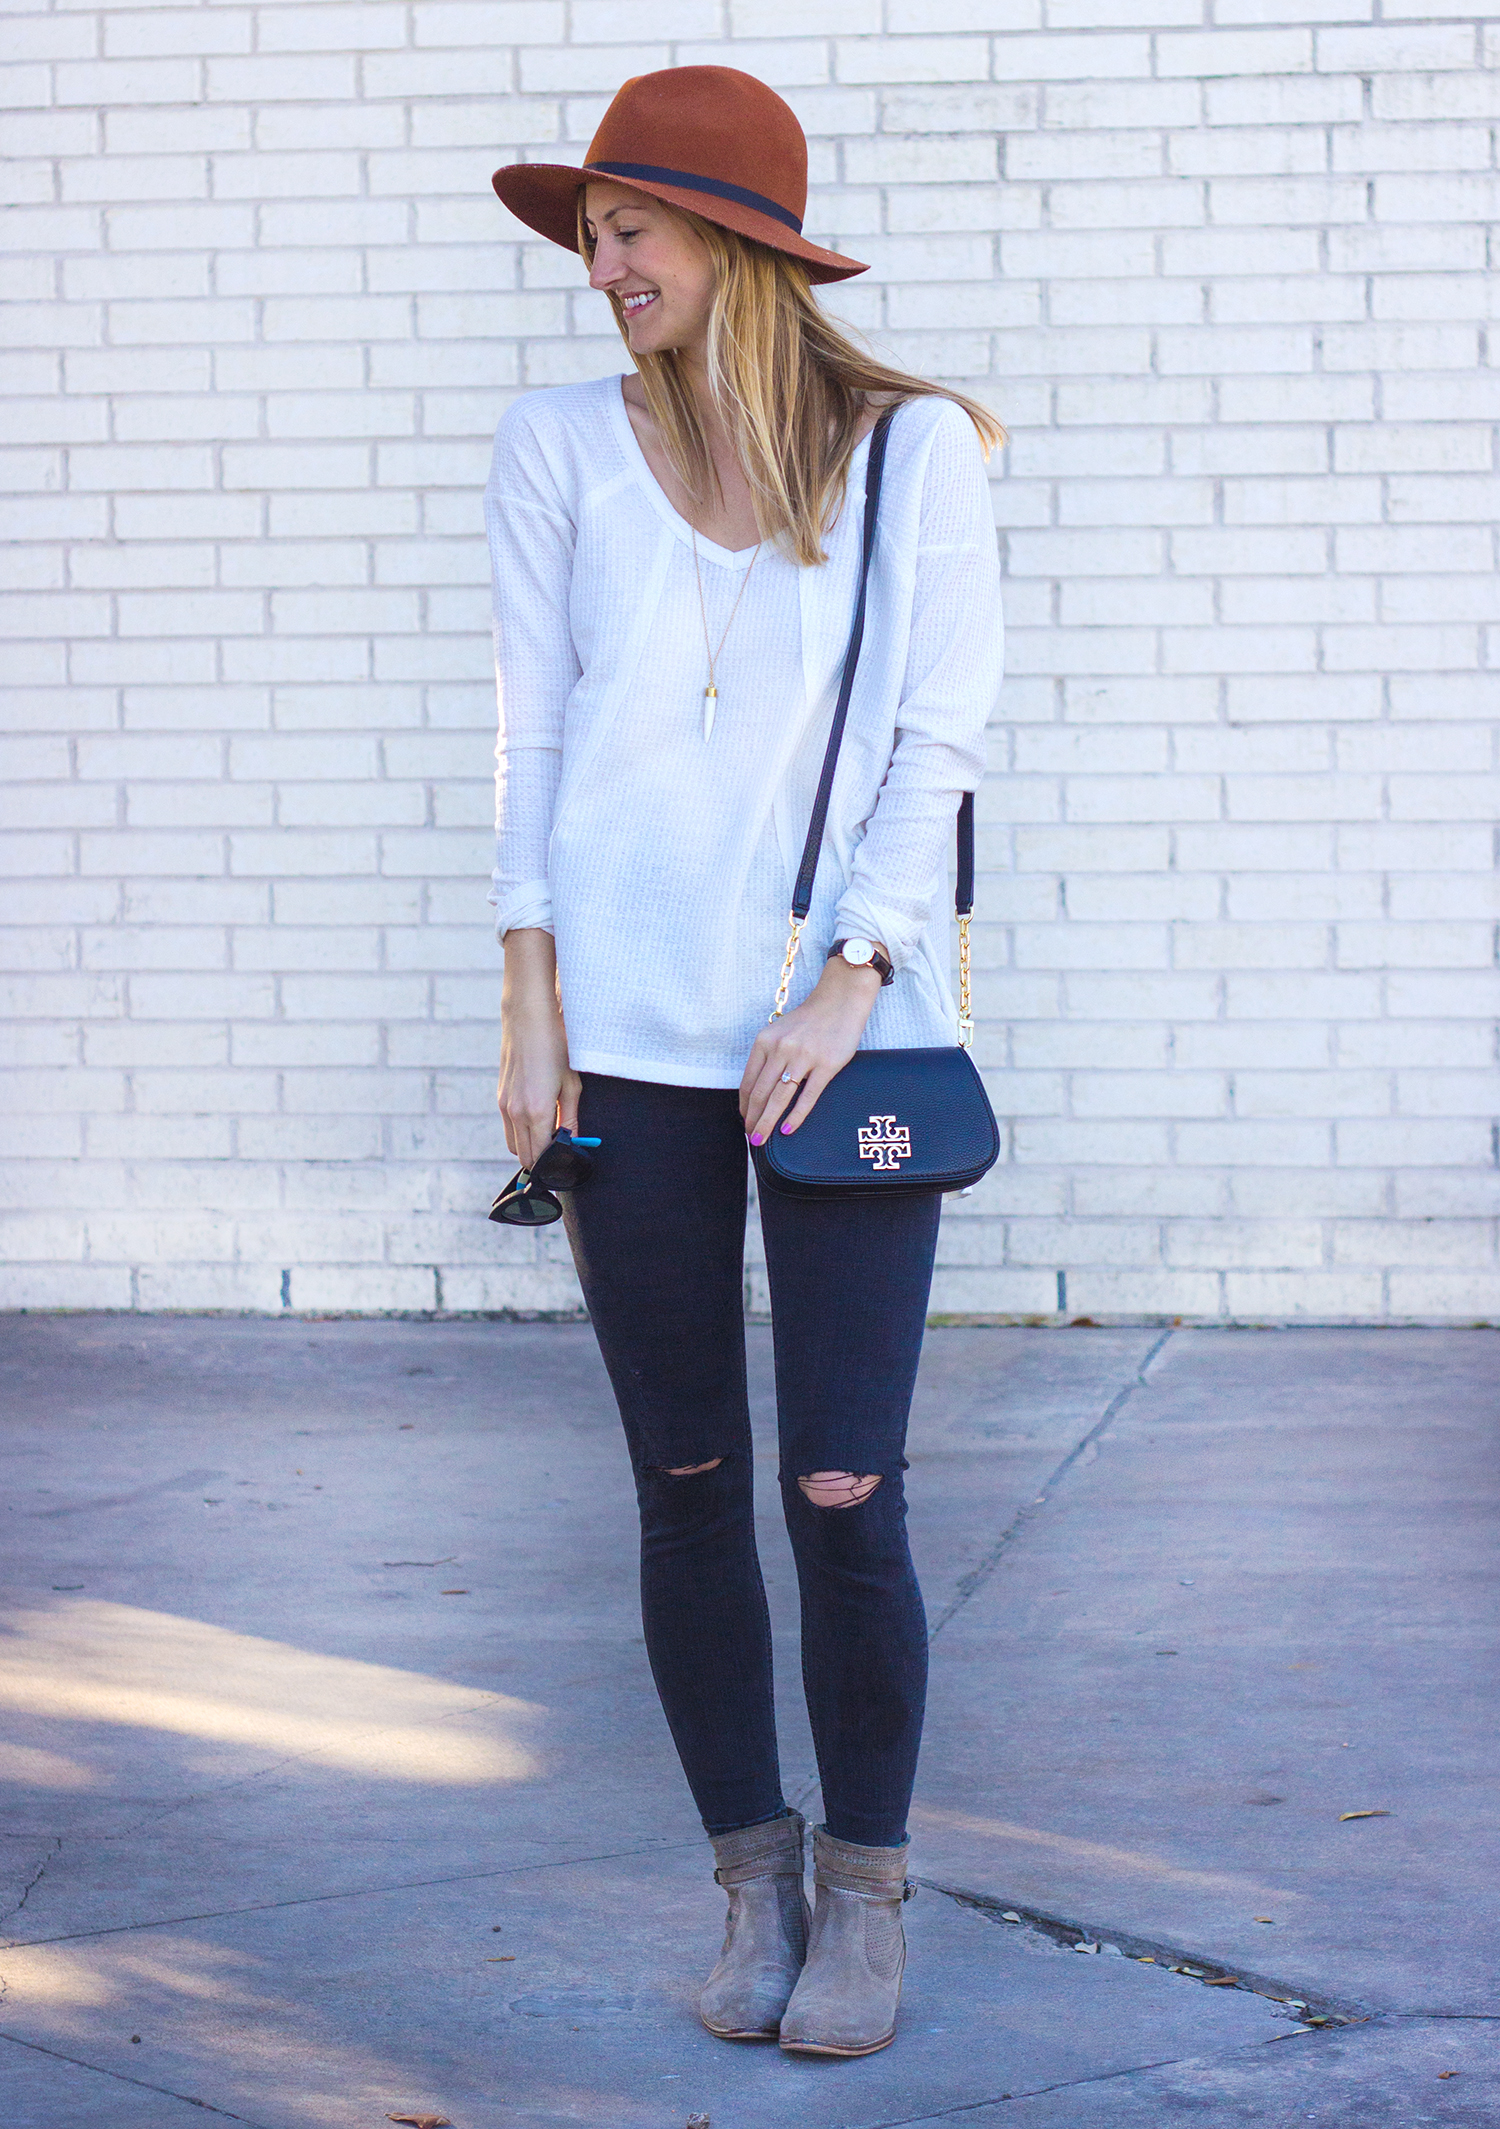 livvyland-blog-olivia-watson-thermal-long-sleeve-cozy-free-people-tee-shirt-topshop-black-distressed-skinny-jeans-austin-texas-fashion-blogger-tory-burch-britten-handbag-black-2